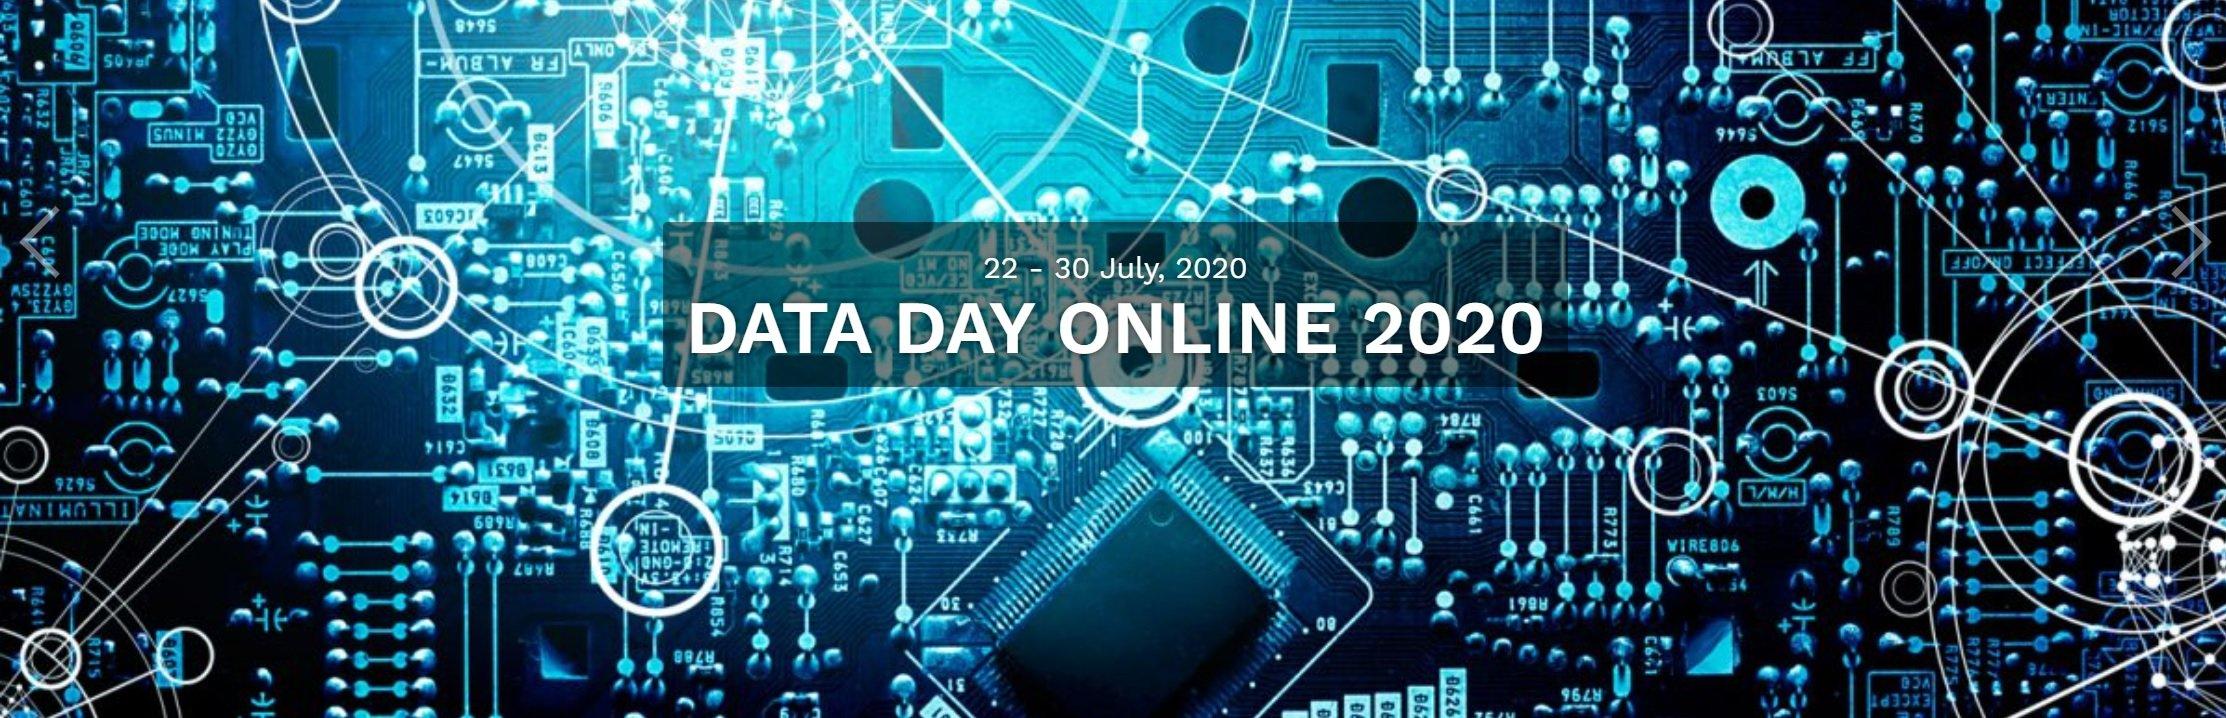 Data Day